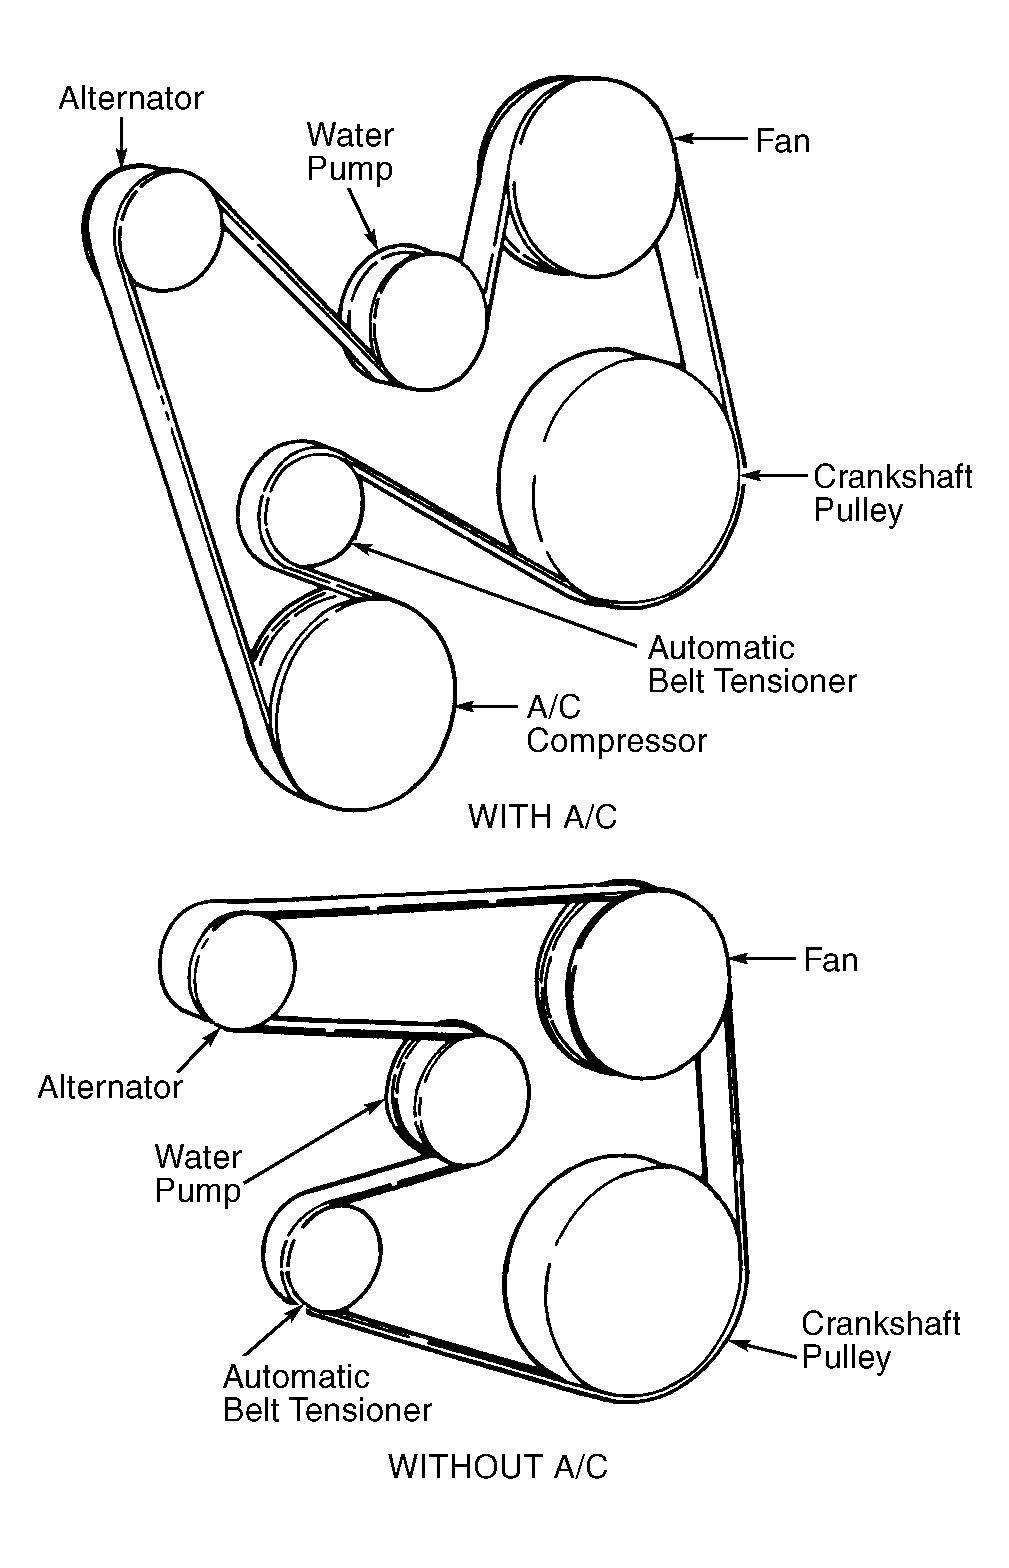 Diagram Download 2006 Dodge Ram Serpentine Belt Diagram Full Hd Version Maxecuter Ledgesstables Lorentzapotheek Nl